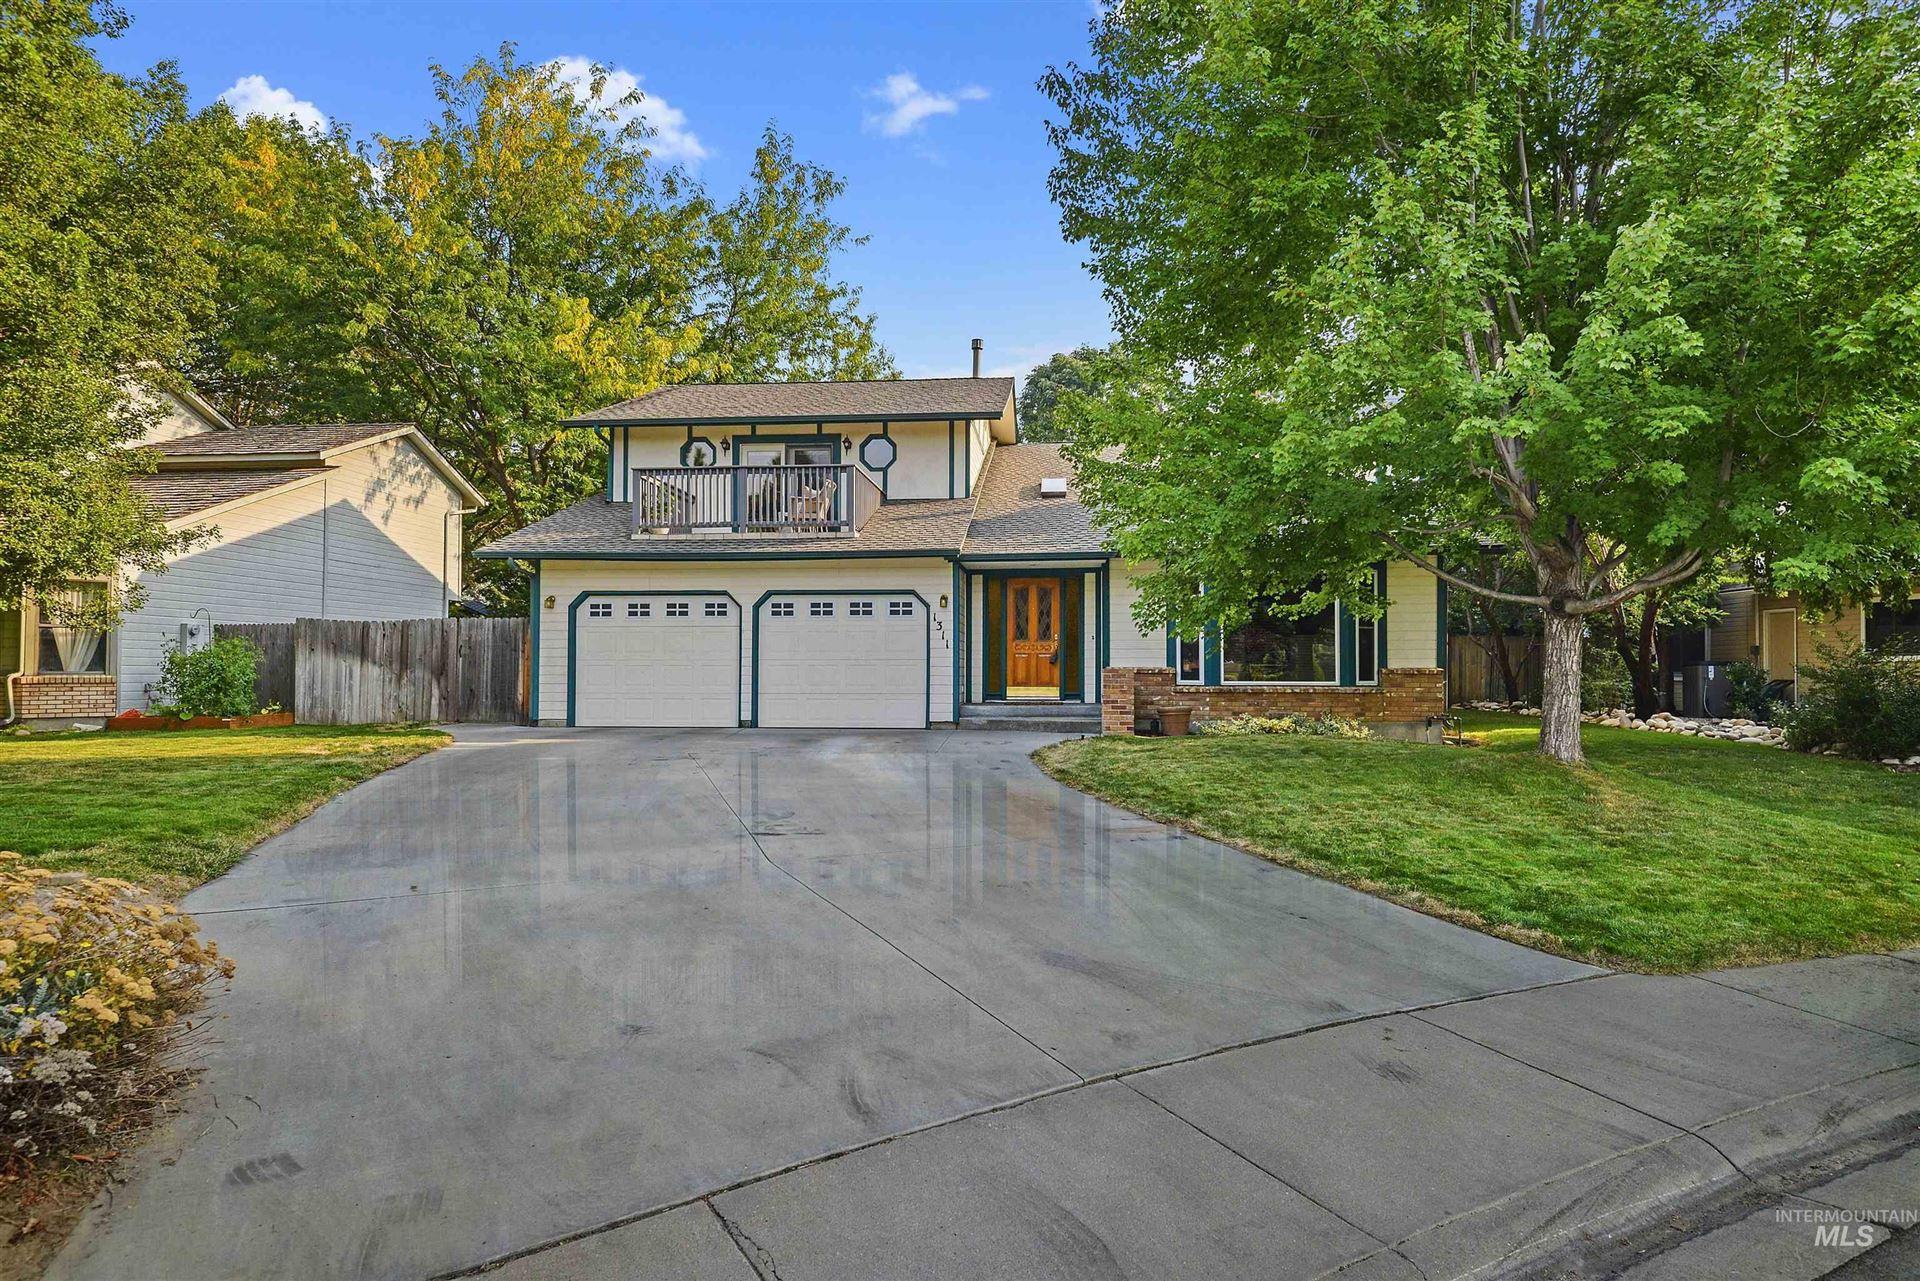 1311 E Lexington Ct, Boise, ID 83706 - MLS#: 98817914